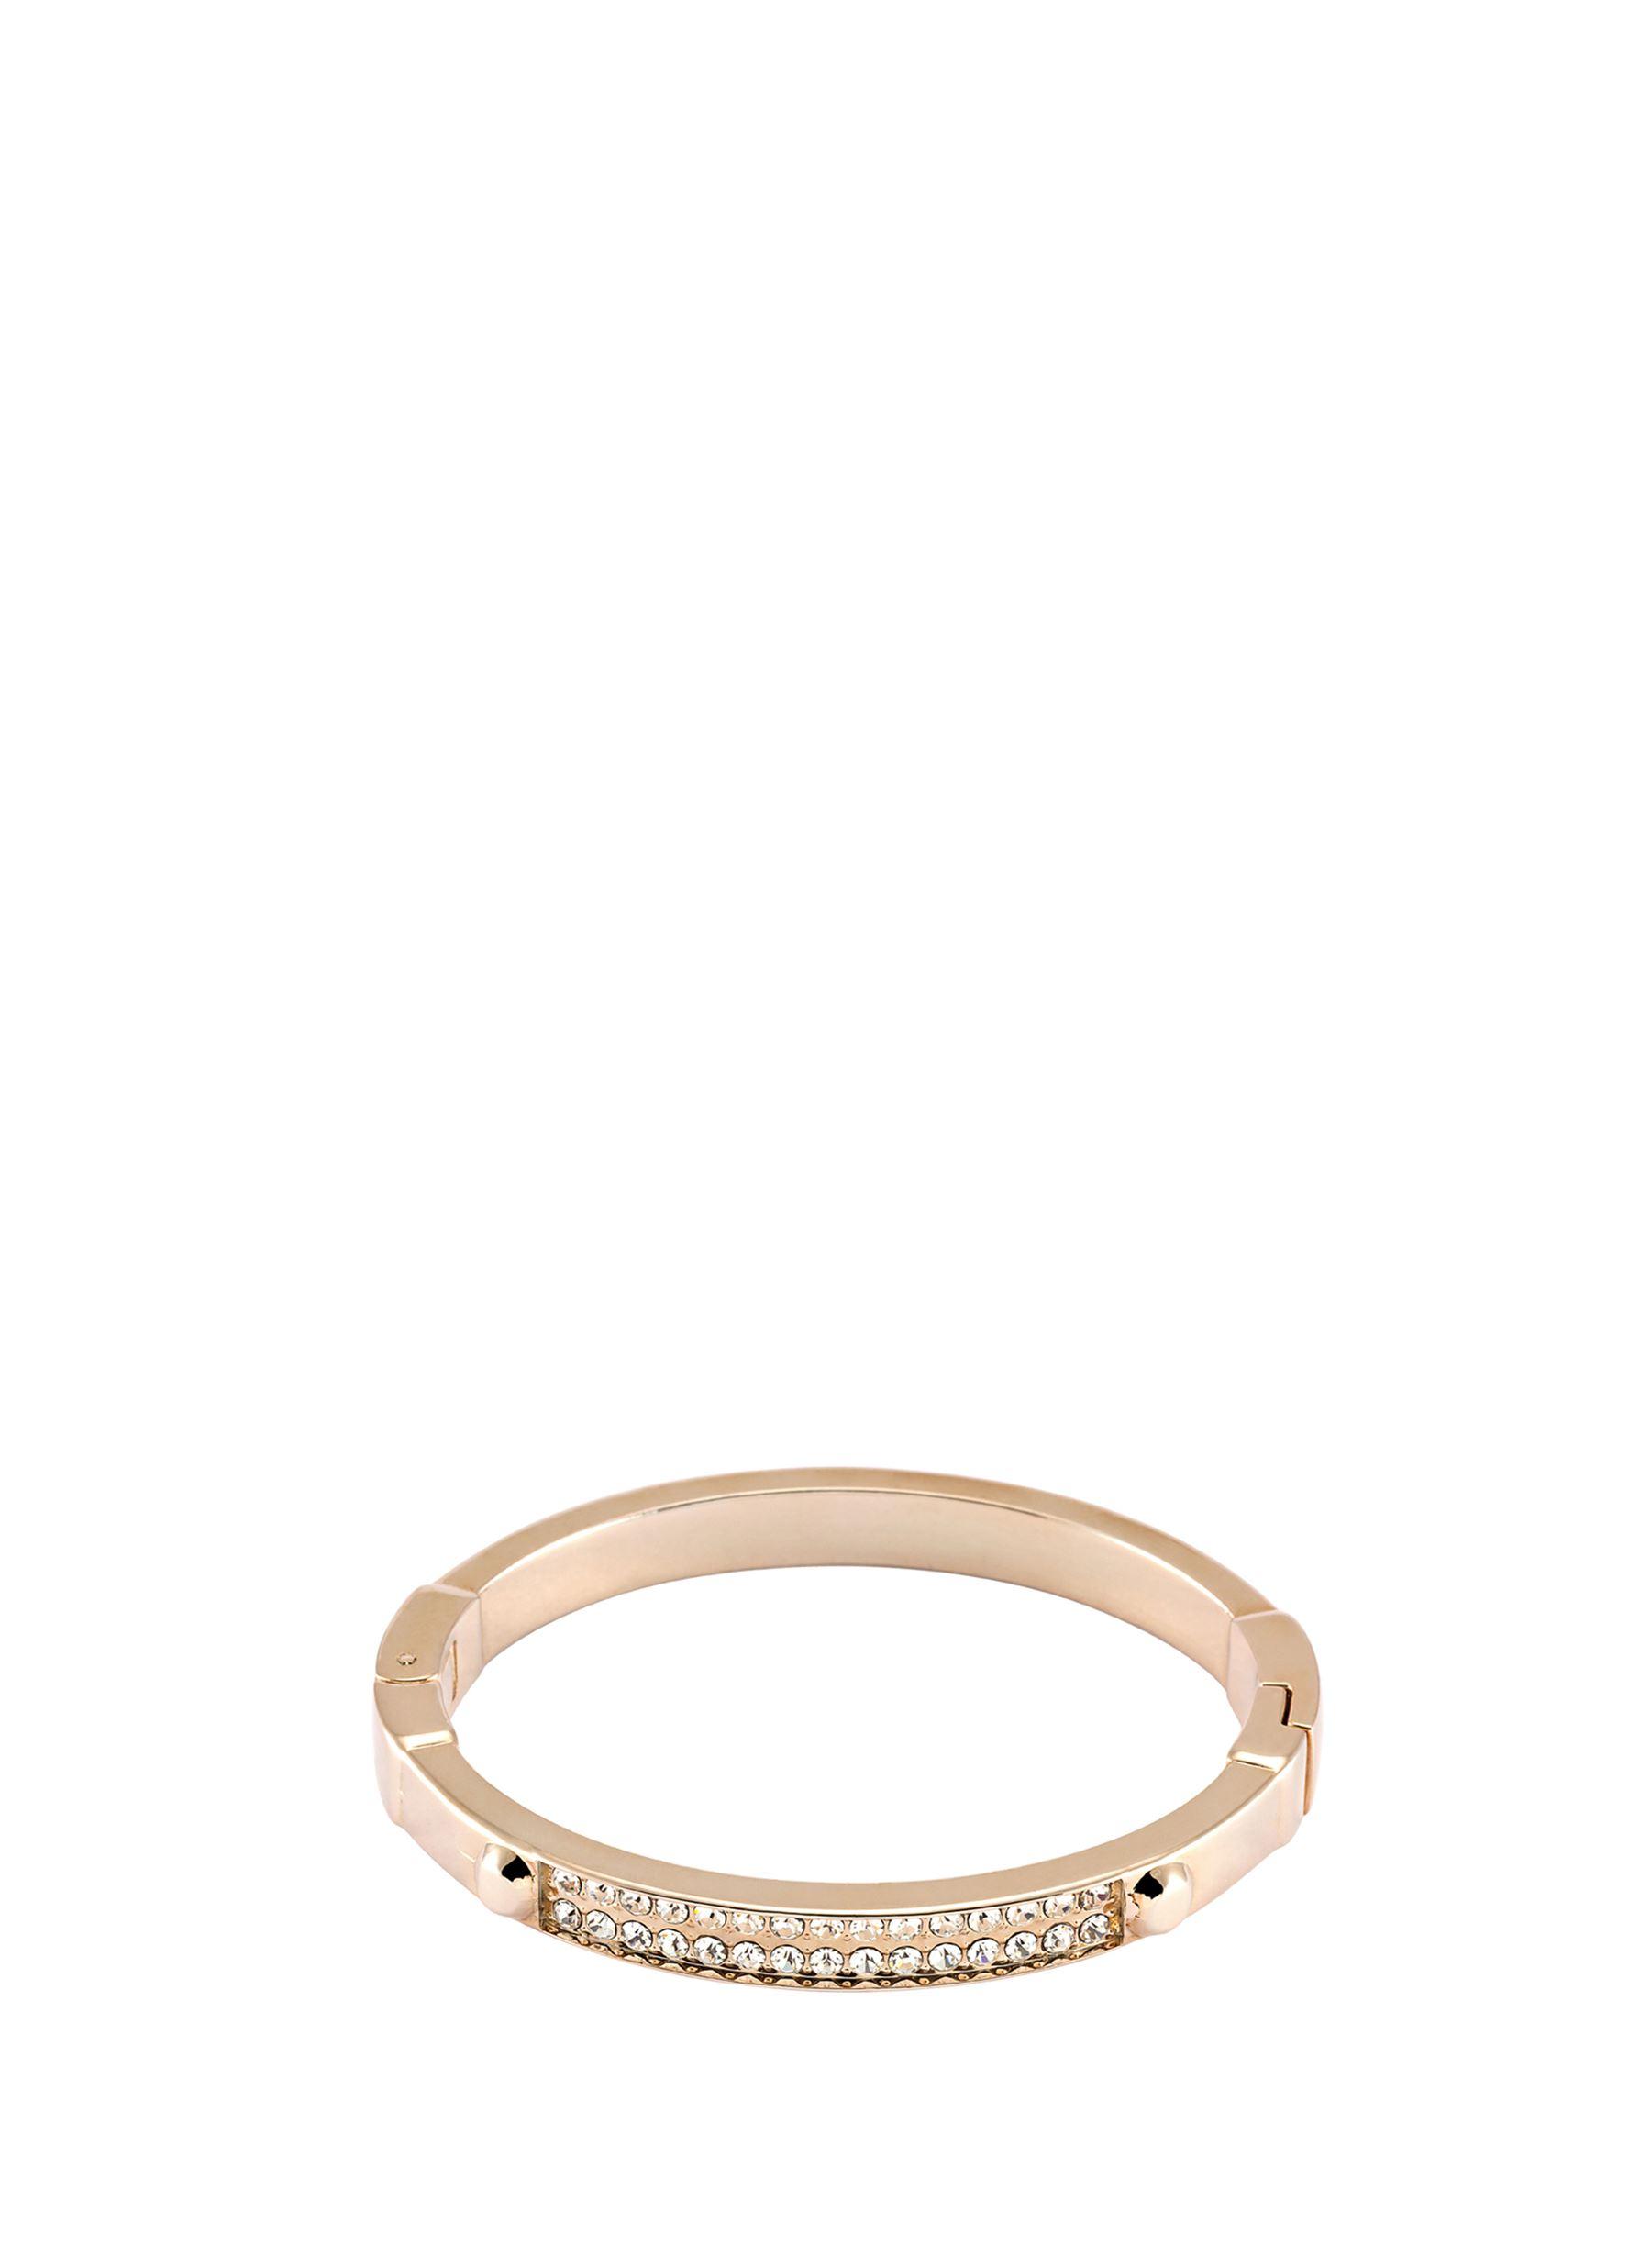 Detailed Look - Βραχιόλι Με Ροζ Χρυσά Διαμάντια Pierre Cardin